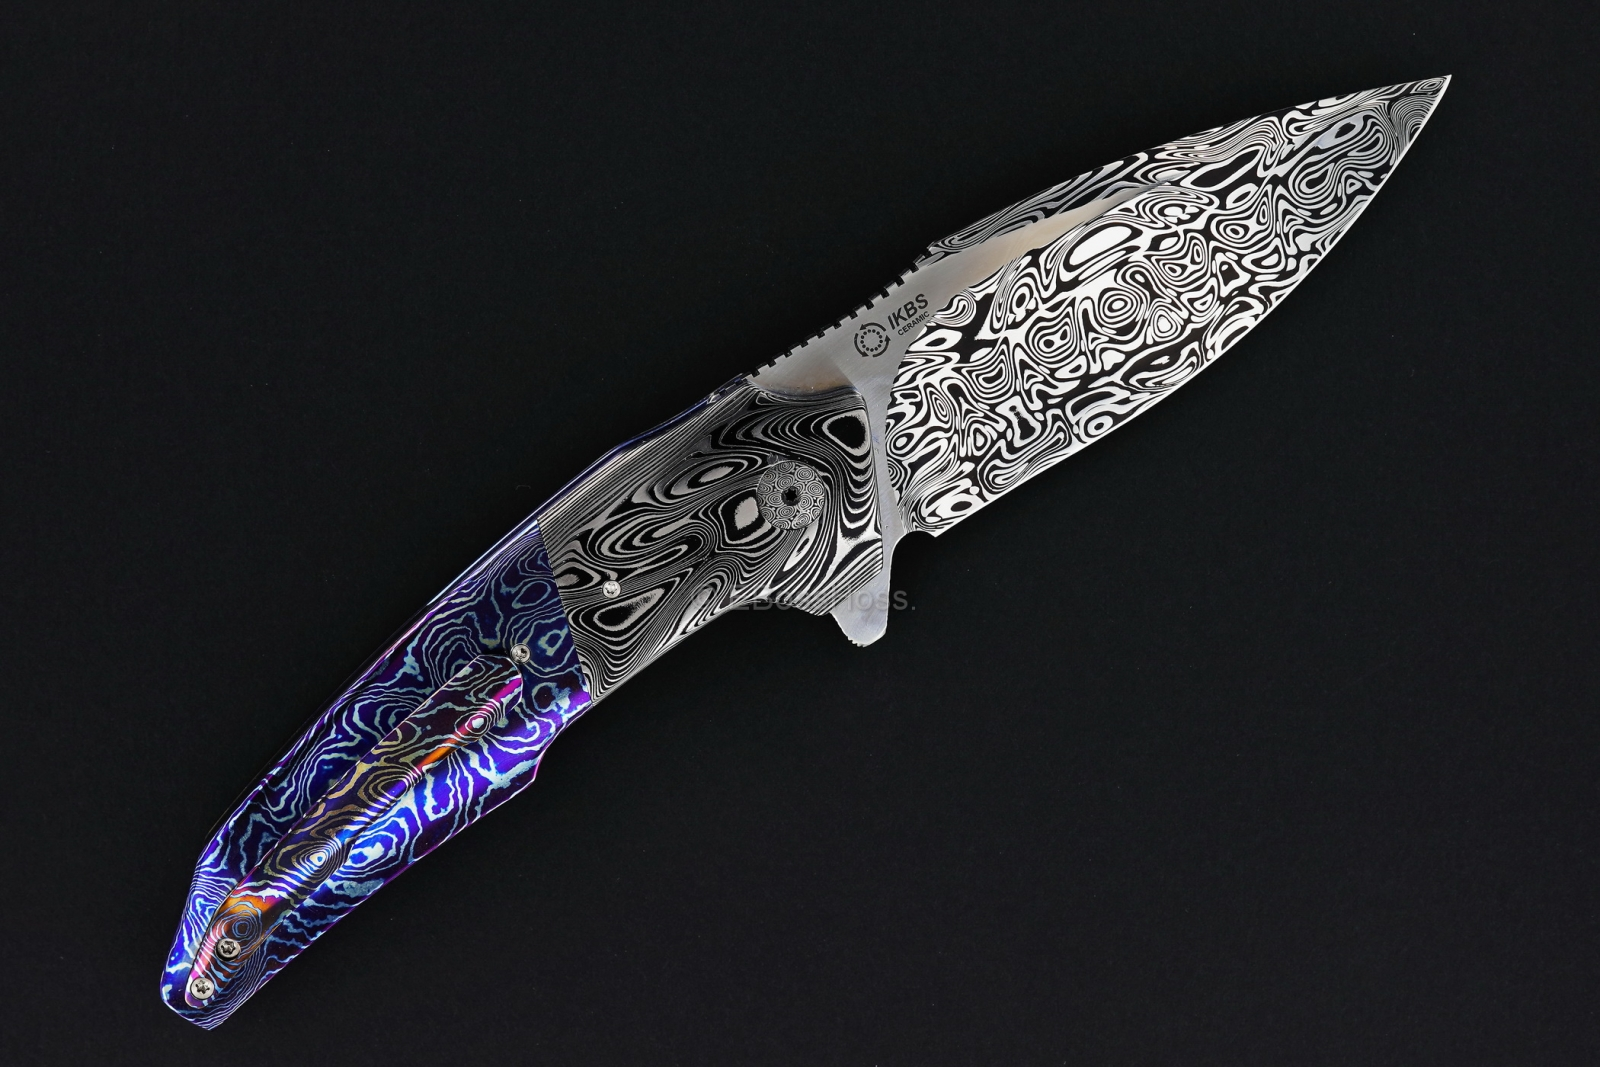 A2 Knives & Tashi Bharucha Custom Very Premium A6 Flipper Collaboration